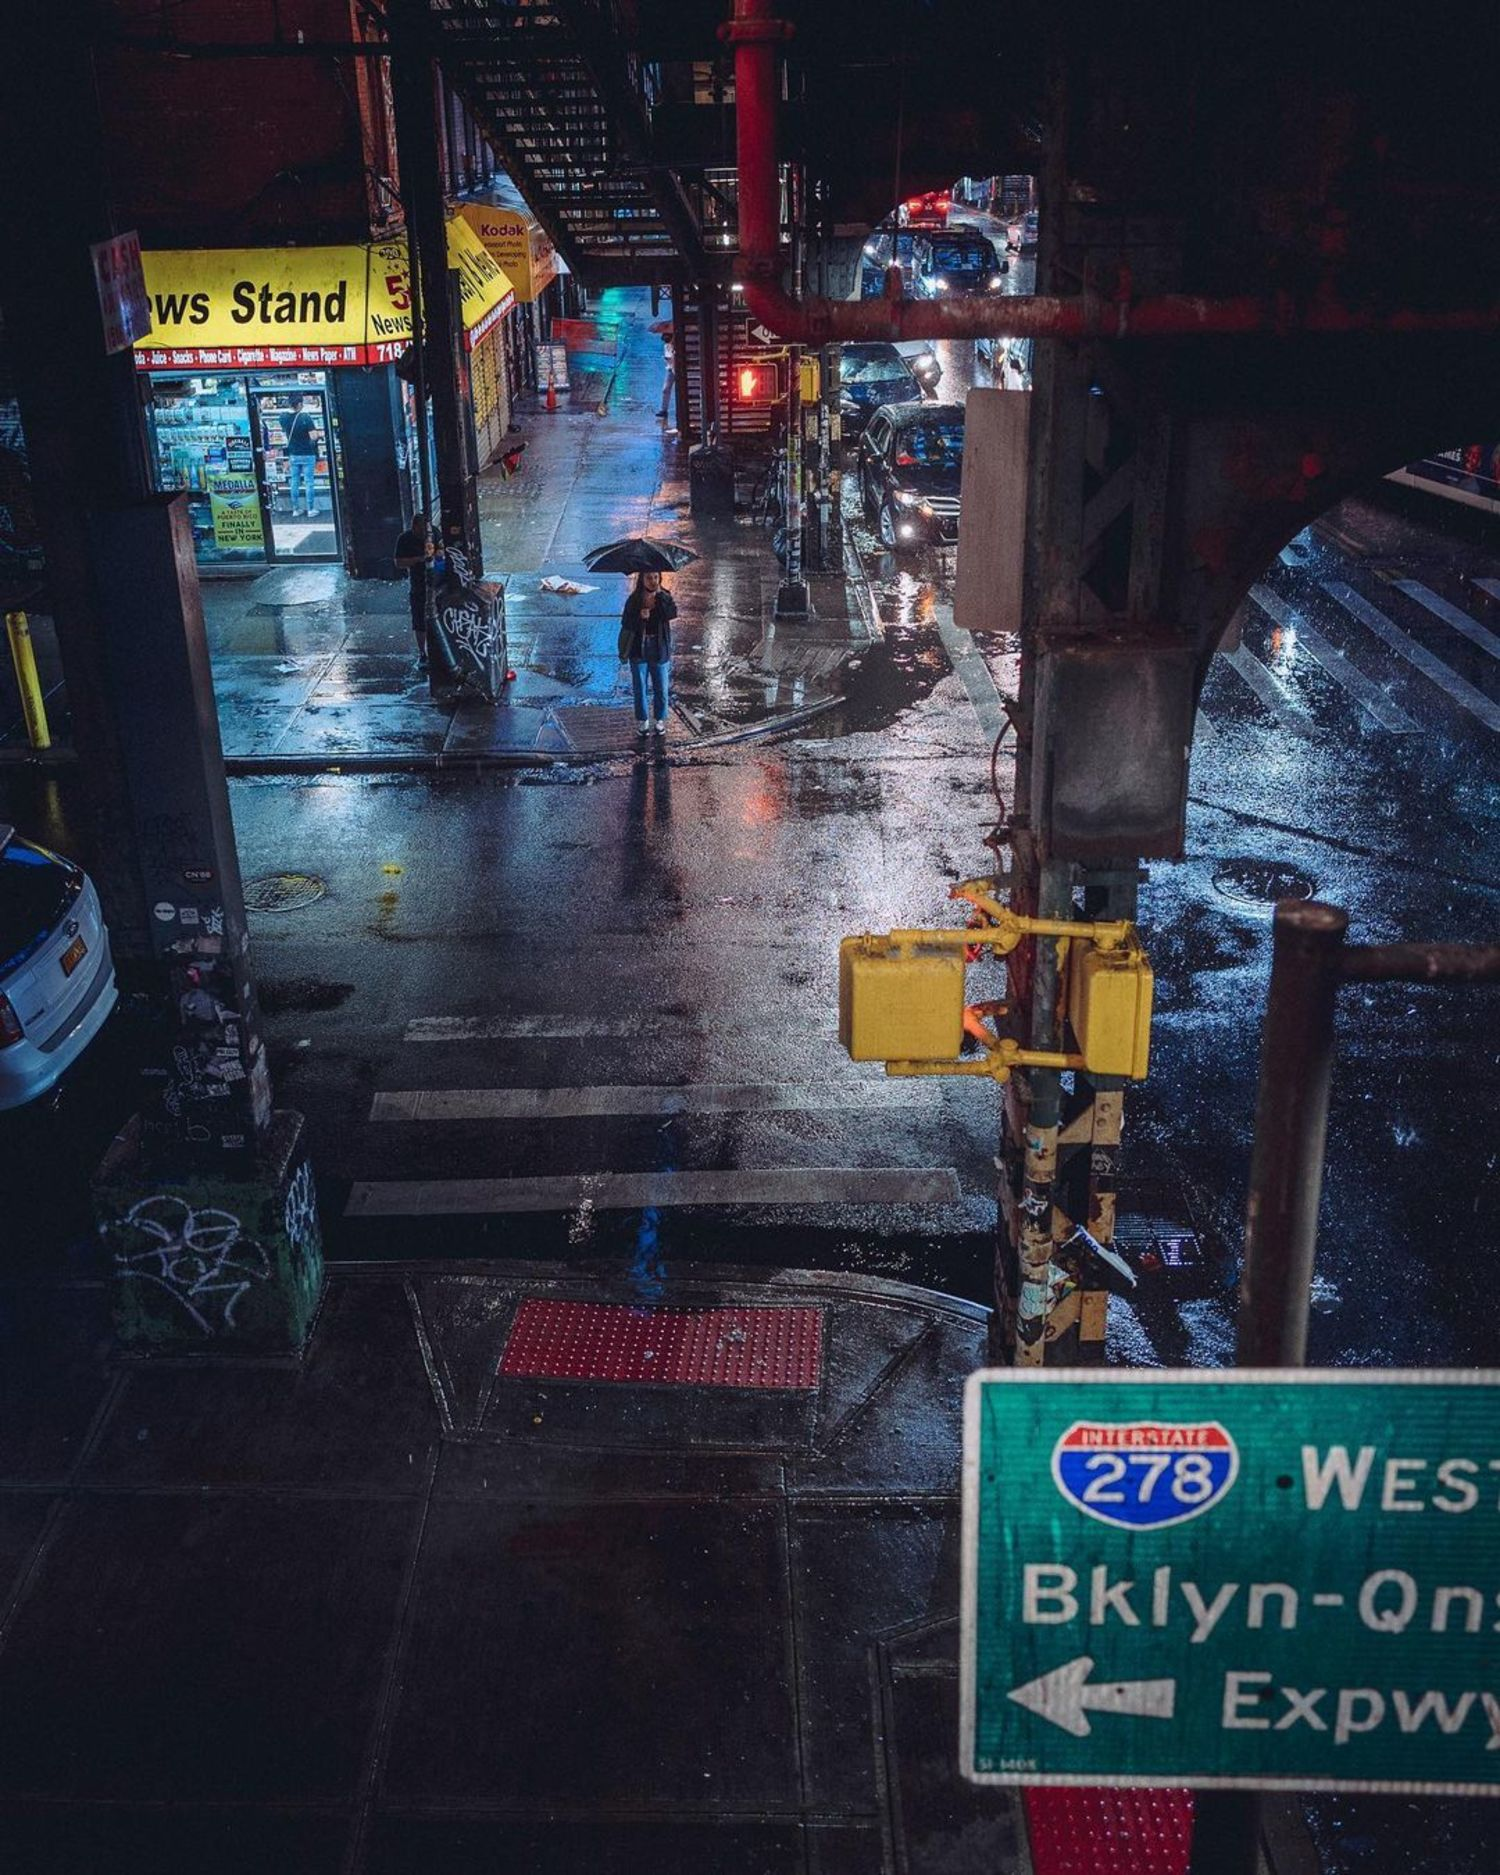 Broadway and Marcy Avenue, Williamsburg, Brooklyn